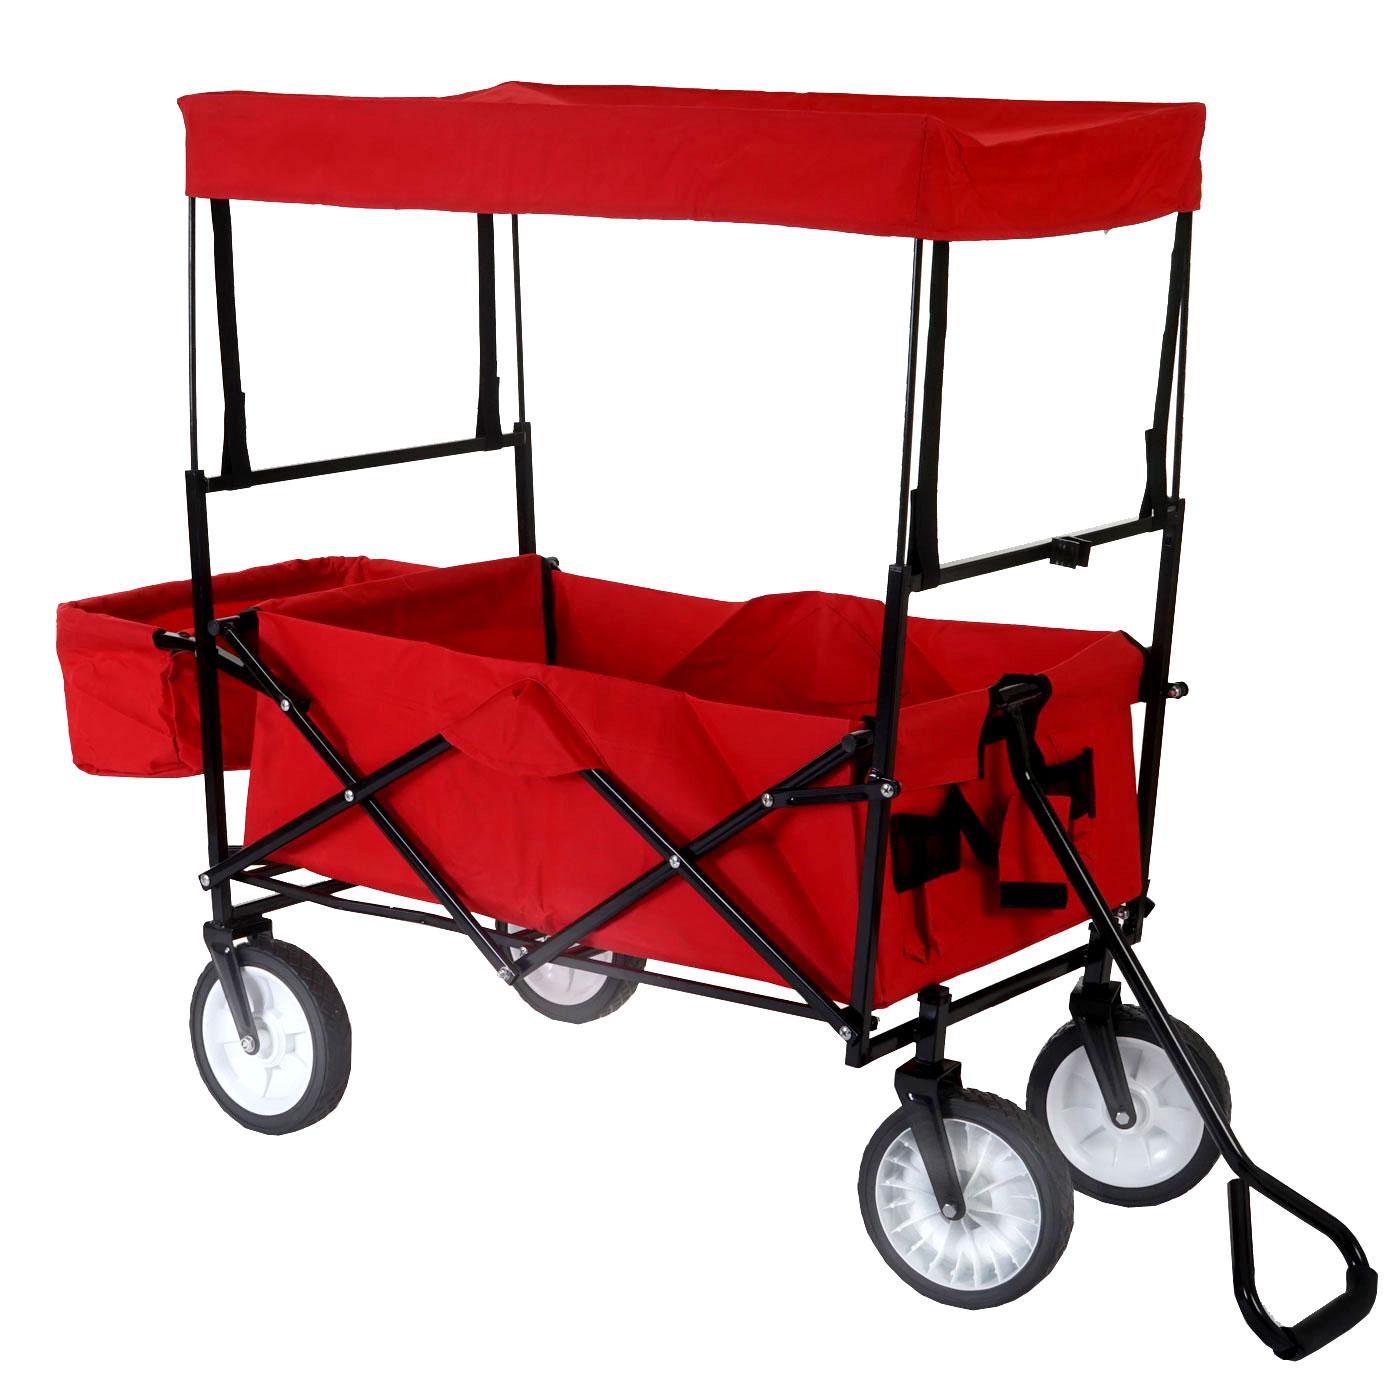 faltbarer bollerwagen morley handwagen transportwagen. Black Bedroom Furniture Sets. Home Design Ideas